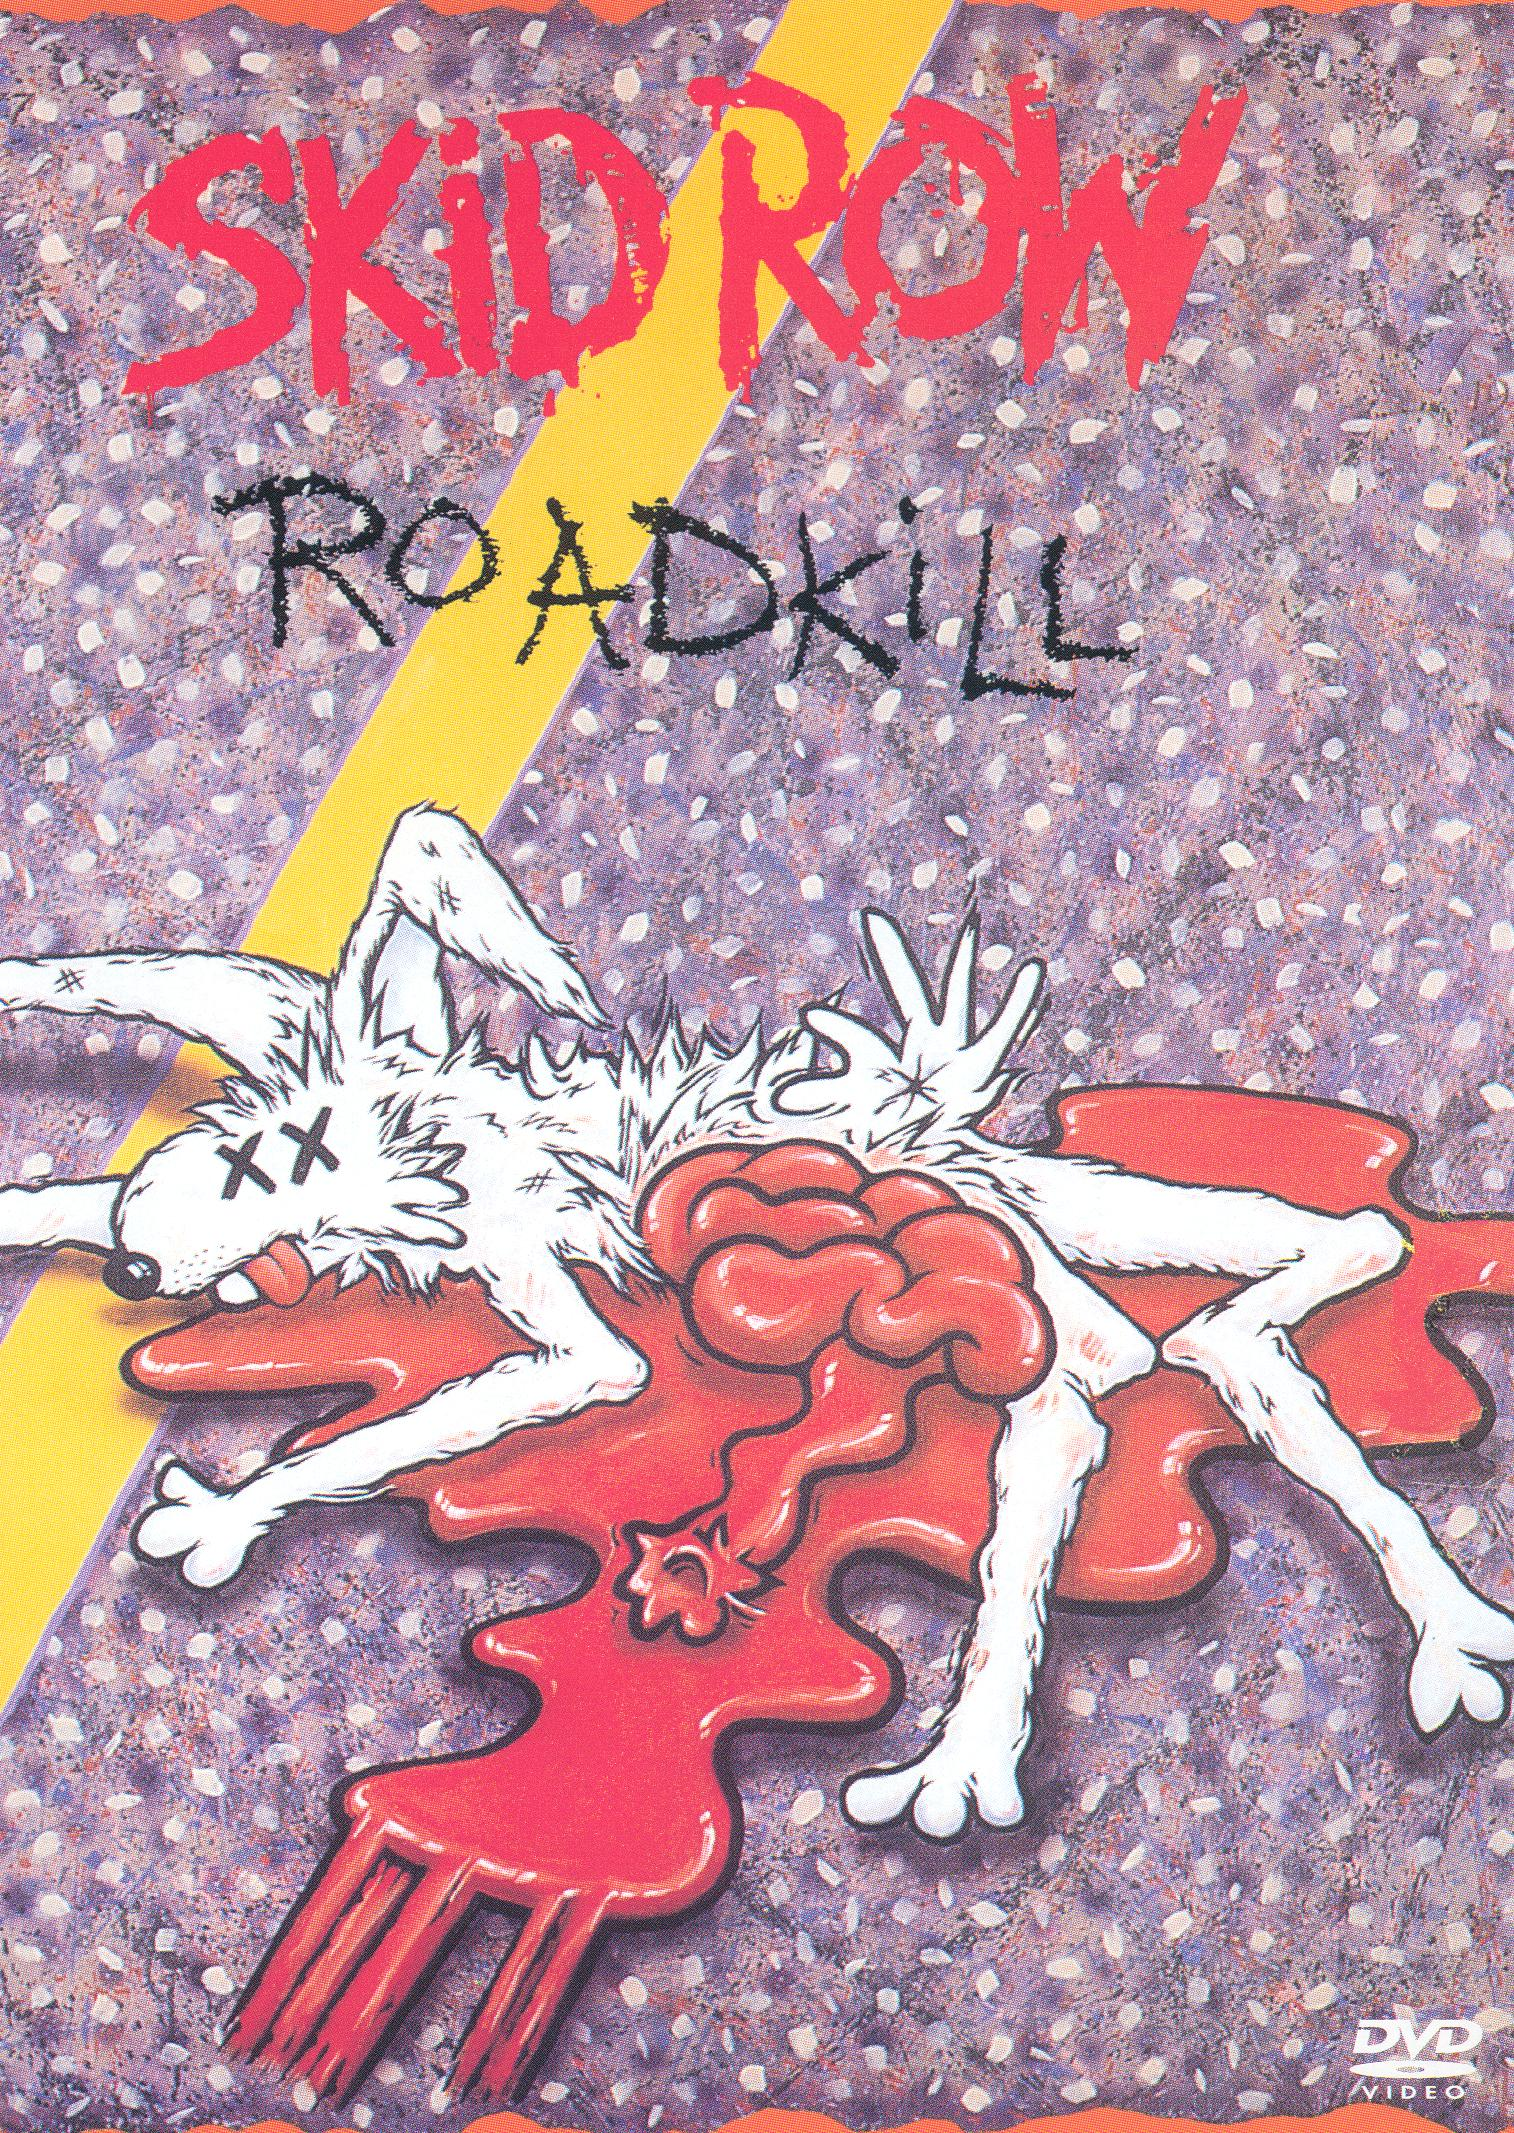 Skid Row: Roadkill